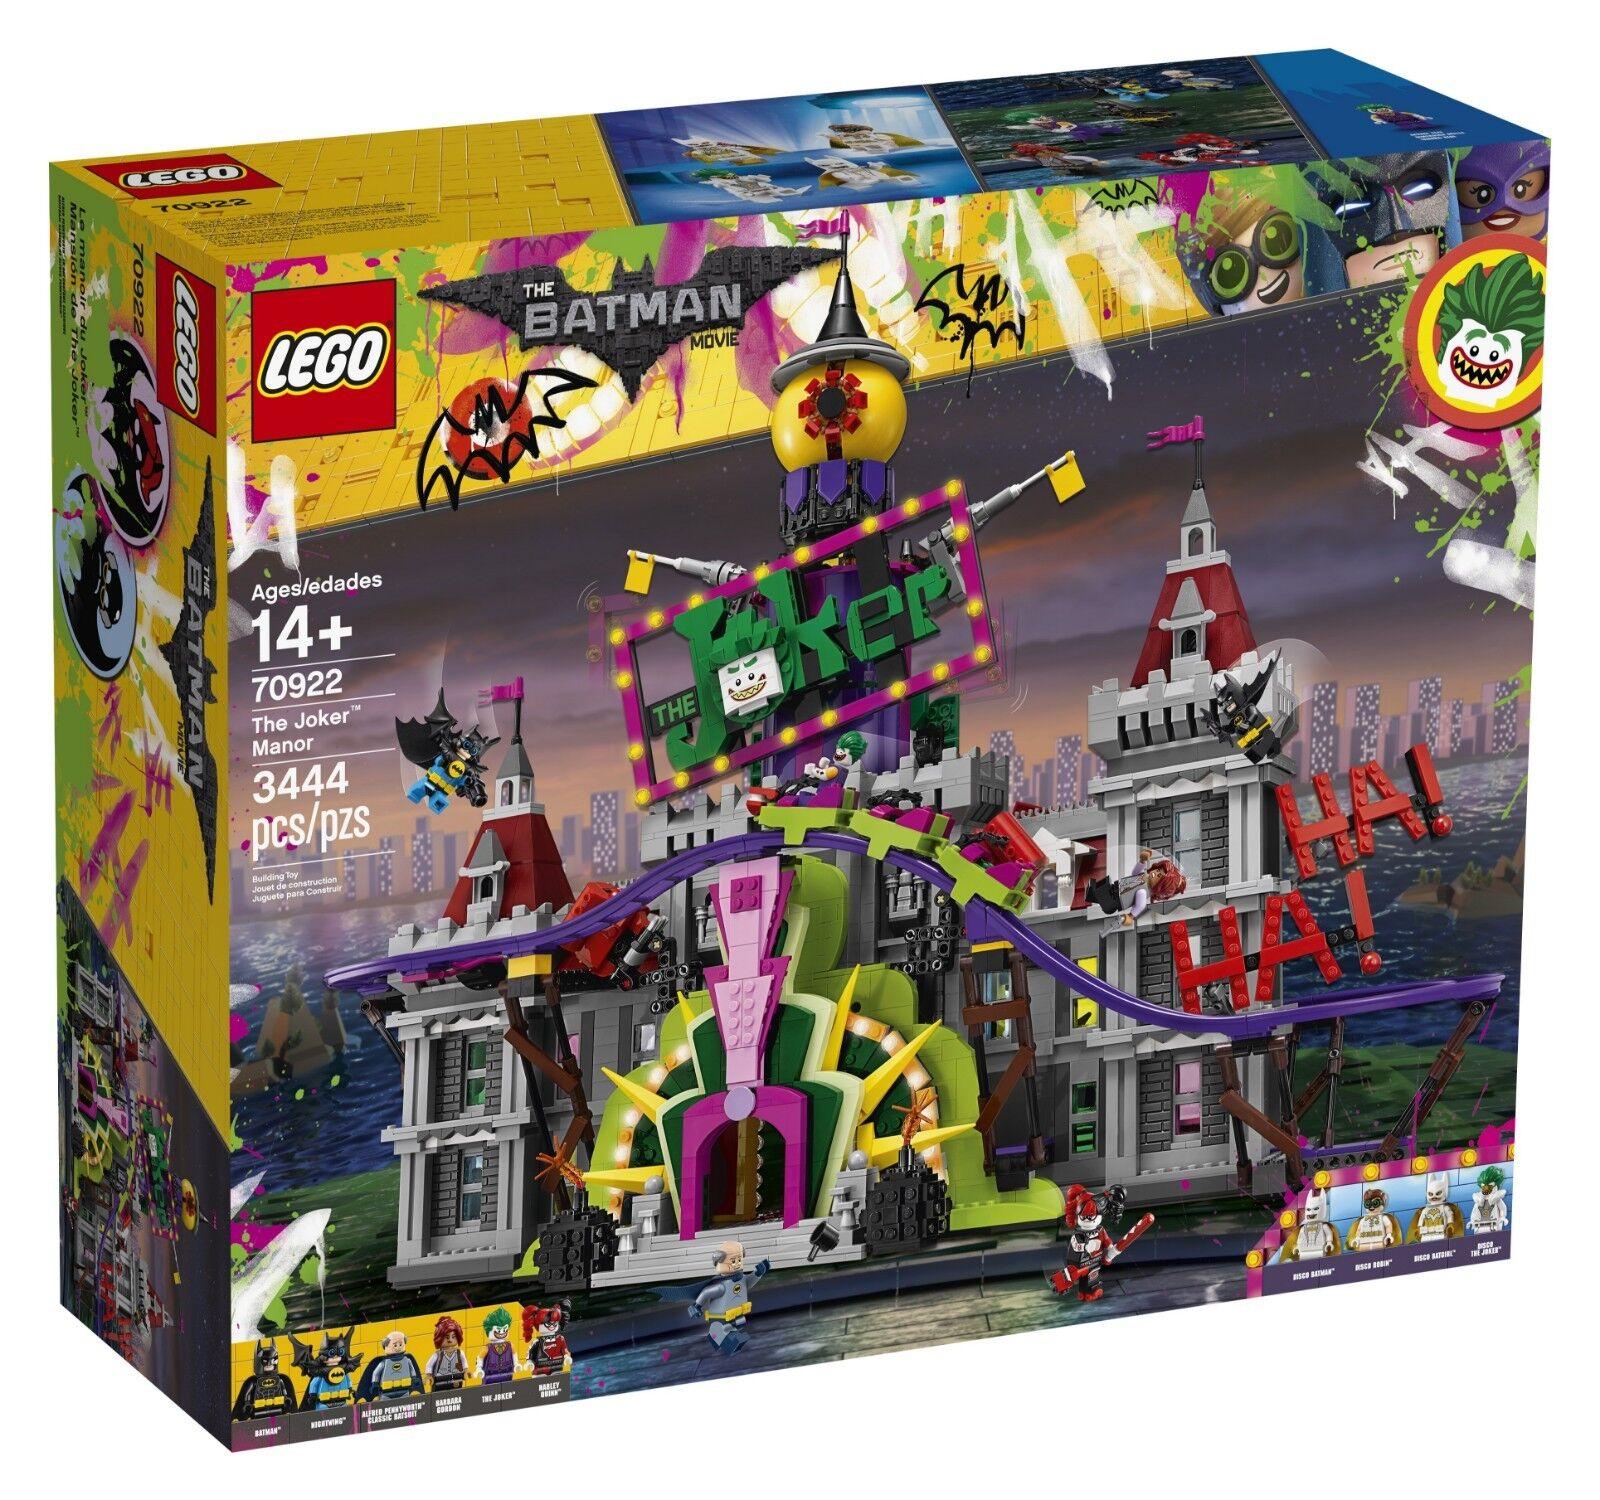 The LEGO Batman Movie The Joker Manor Set 70922